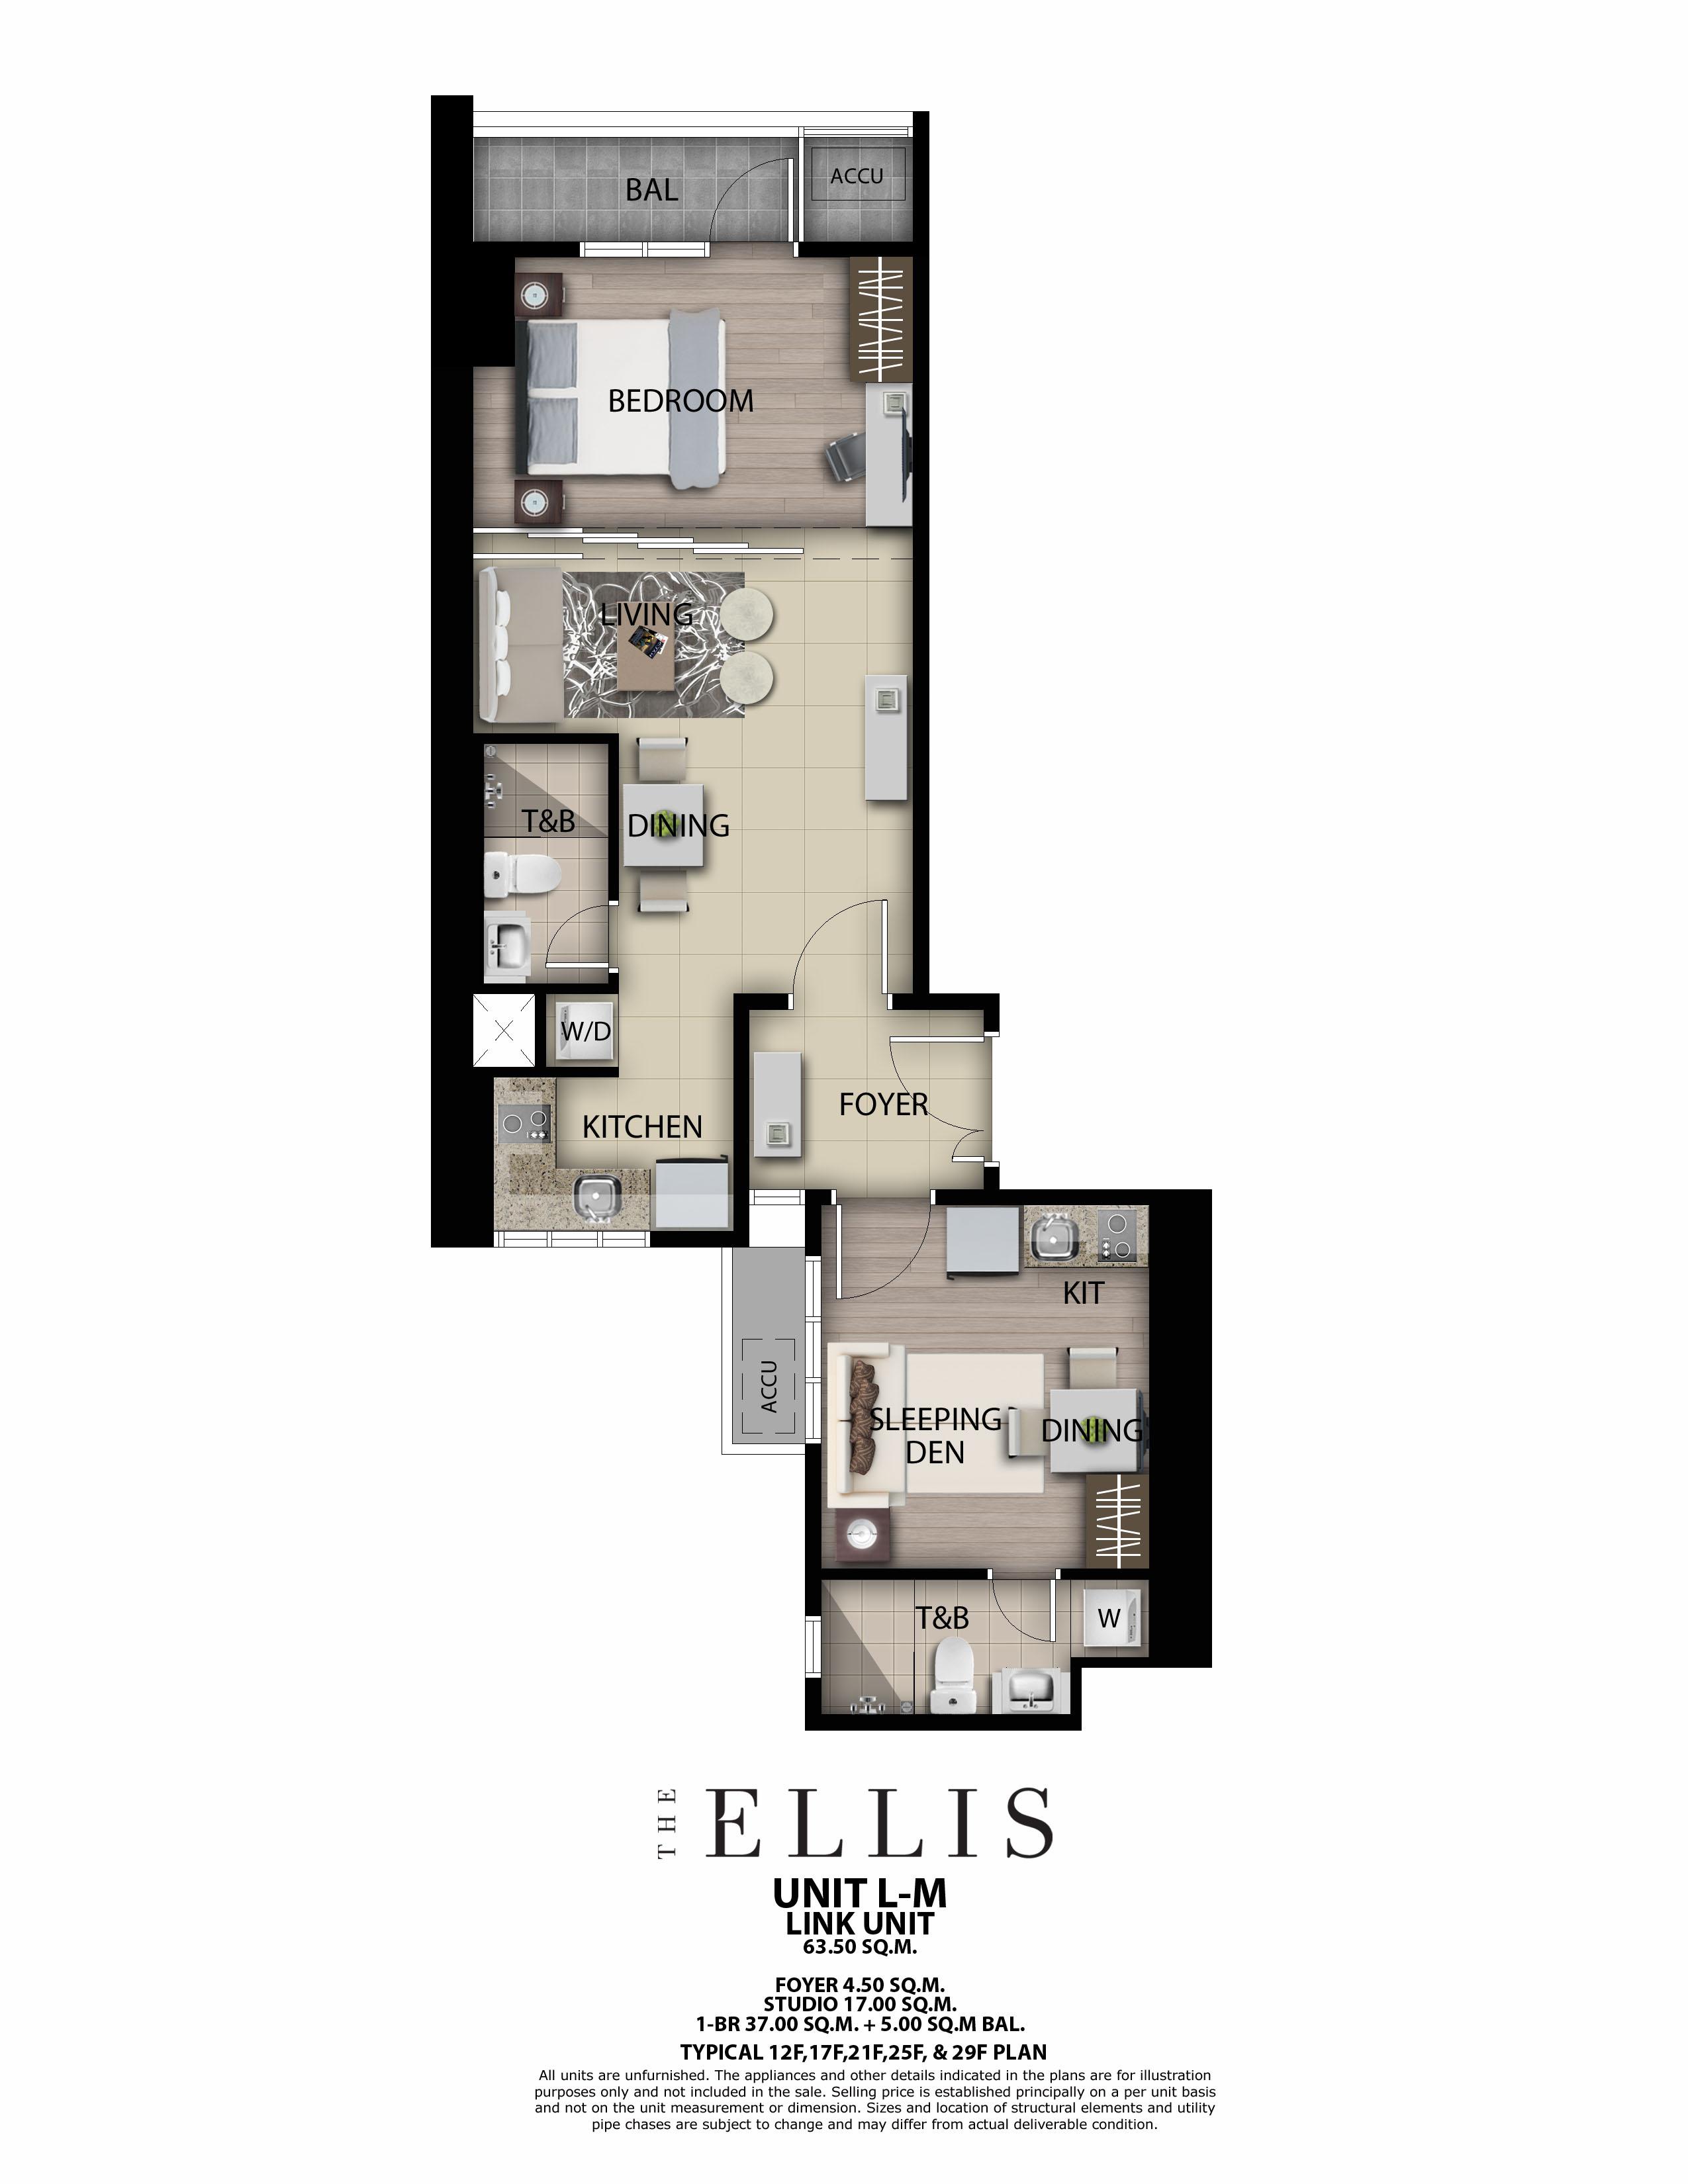 The Ellis 1BR Link unit 63.5 SQM w/ Balcony